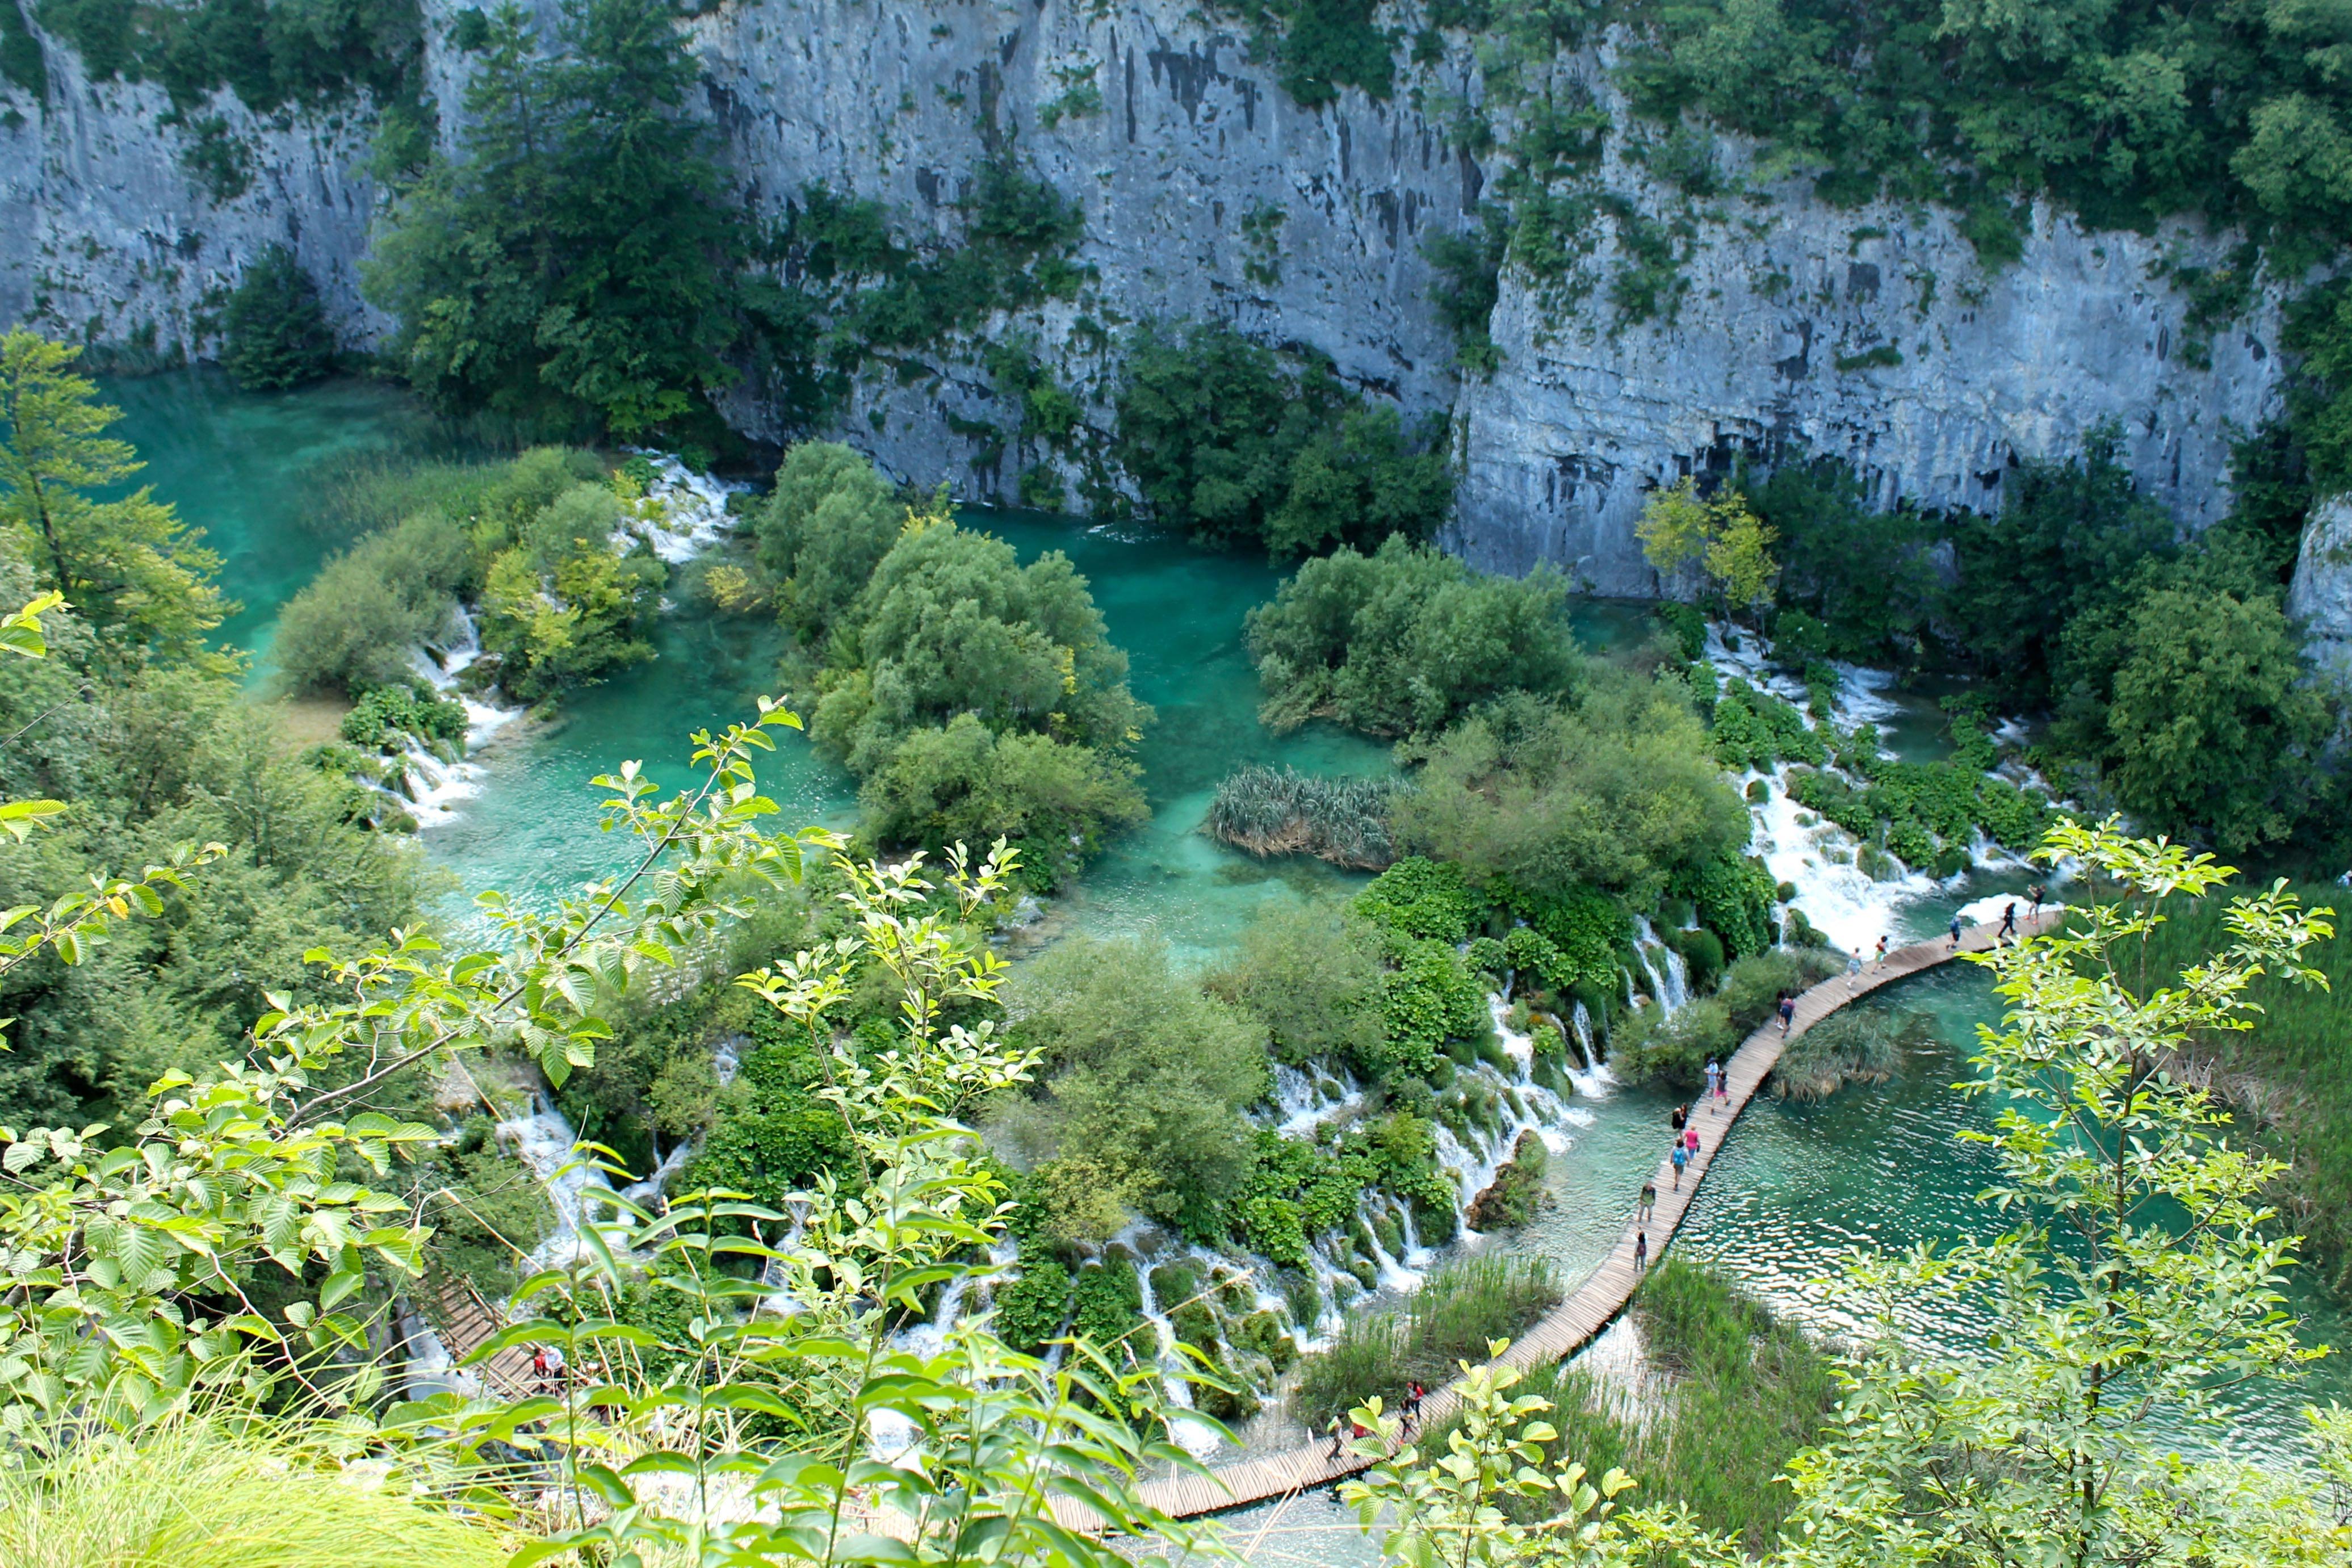 Ruta en bici de Croacia a Montenegro